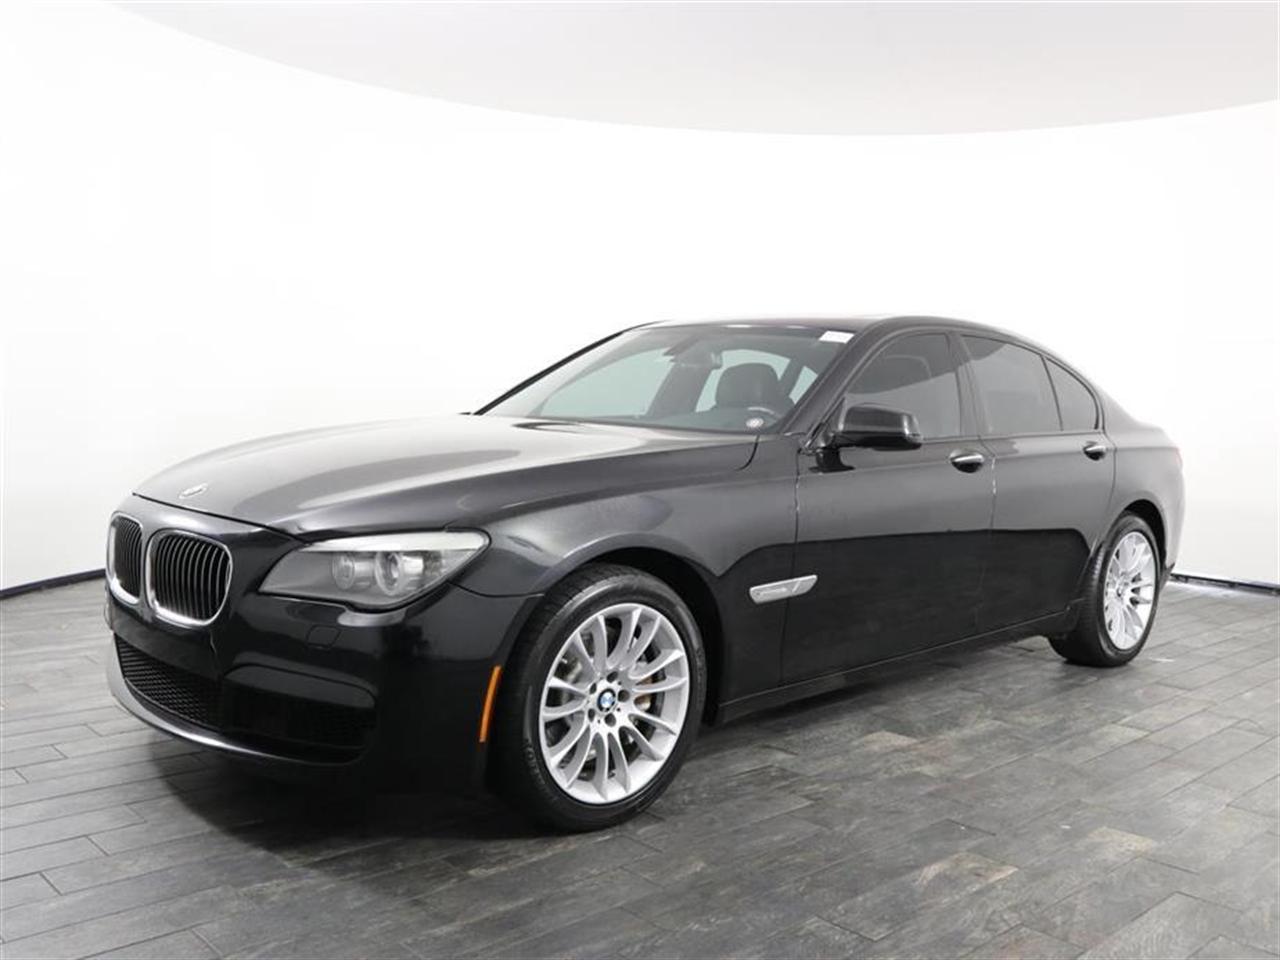 2012 BMW 7 SERIES 4dr Sdn 750i RWD 28093 miles VIN WBAKA8C58CDX01021